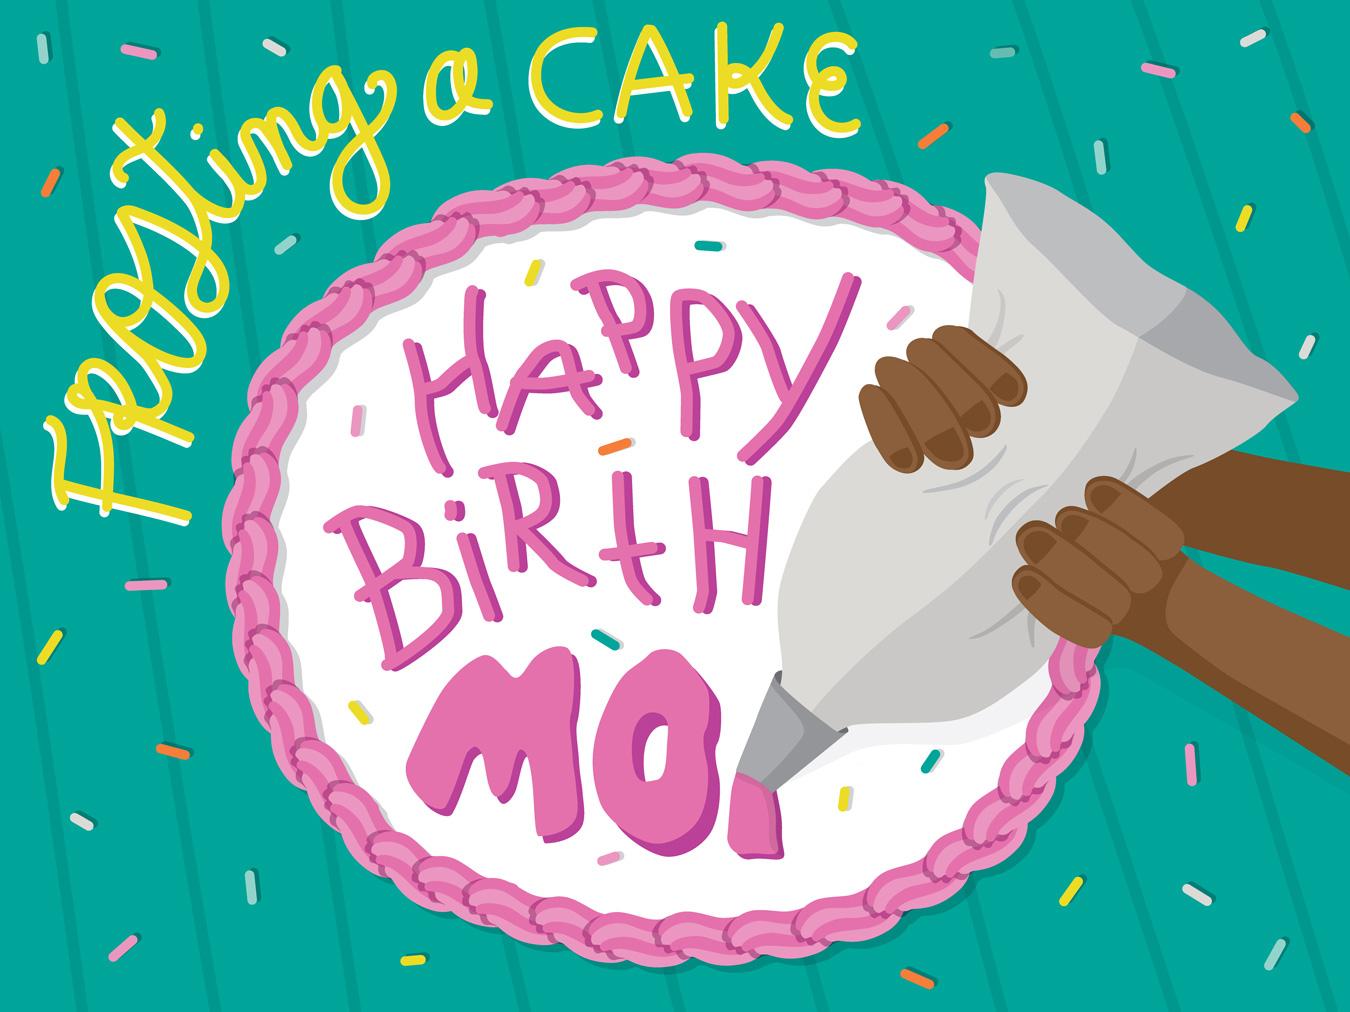 editorial cake decorating illustration